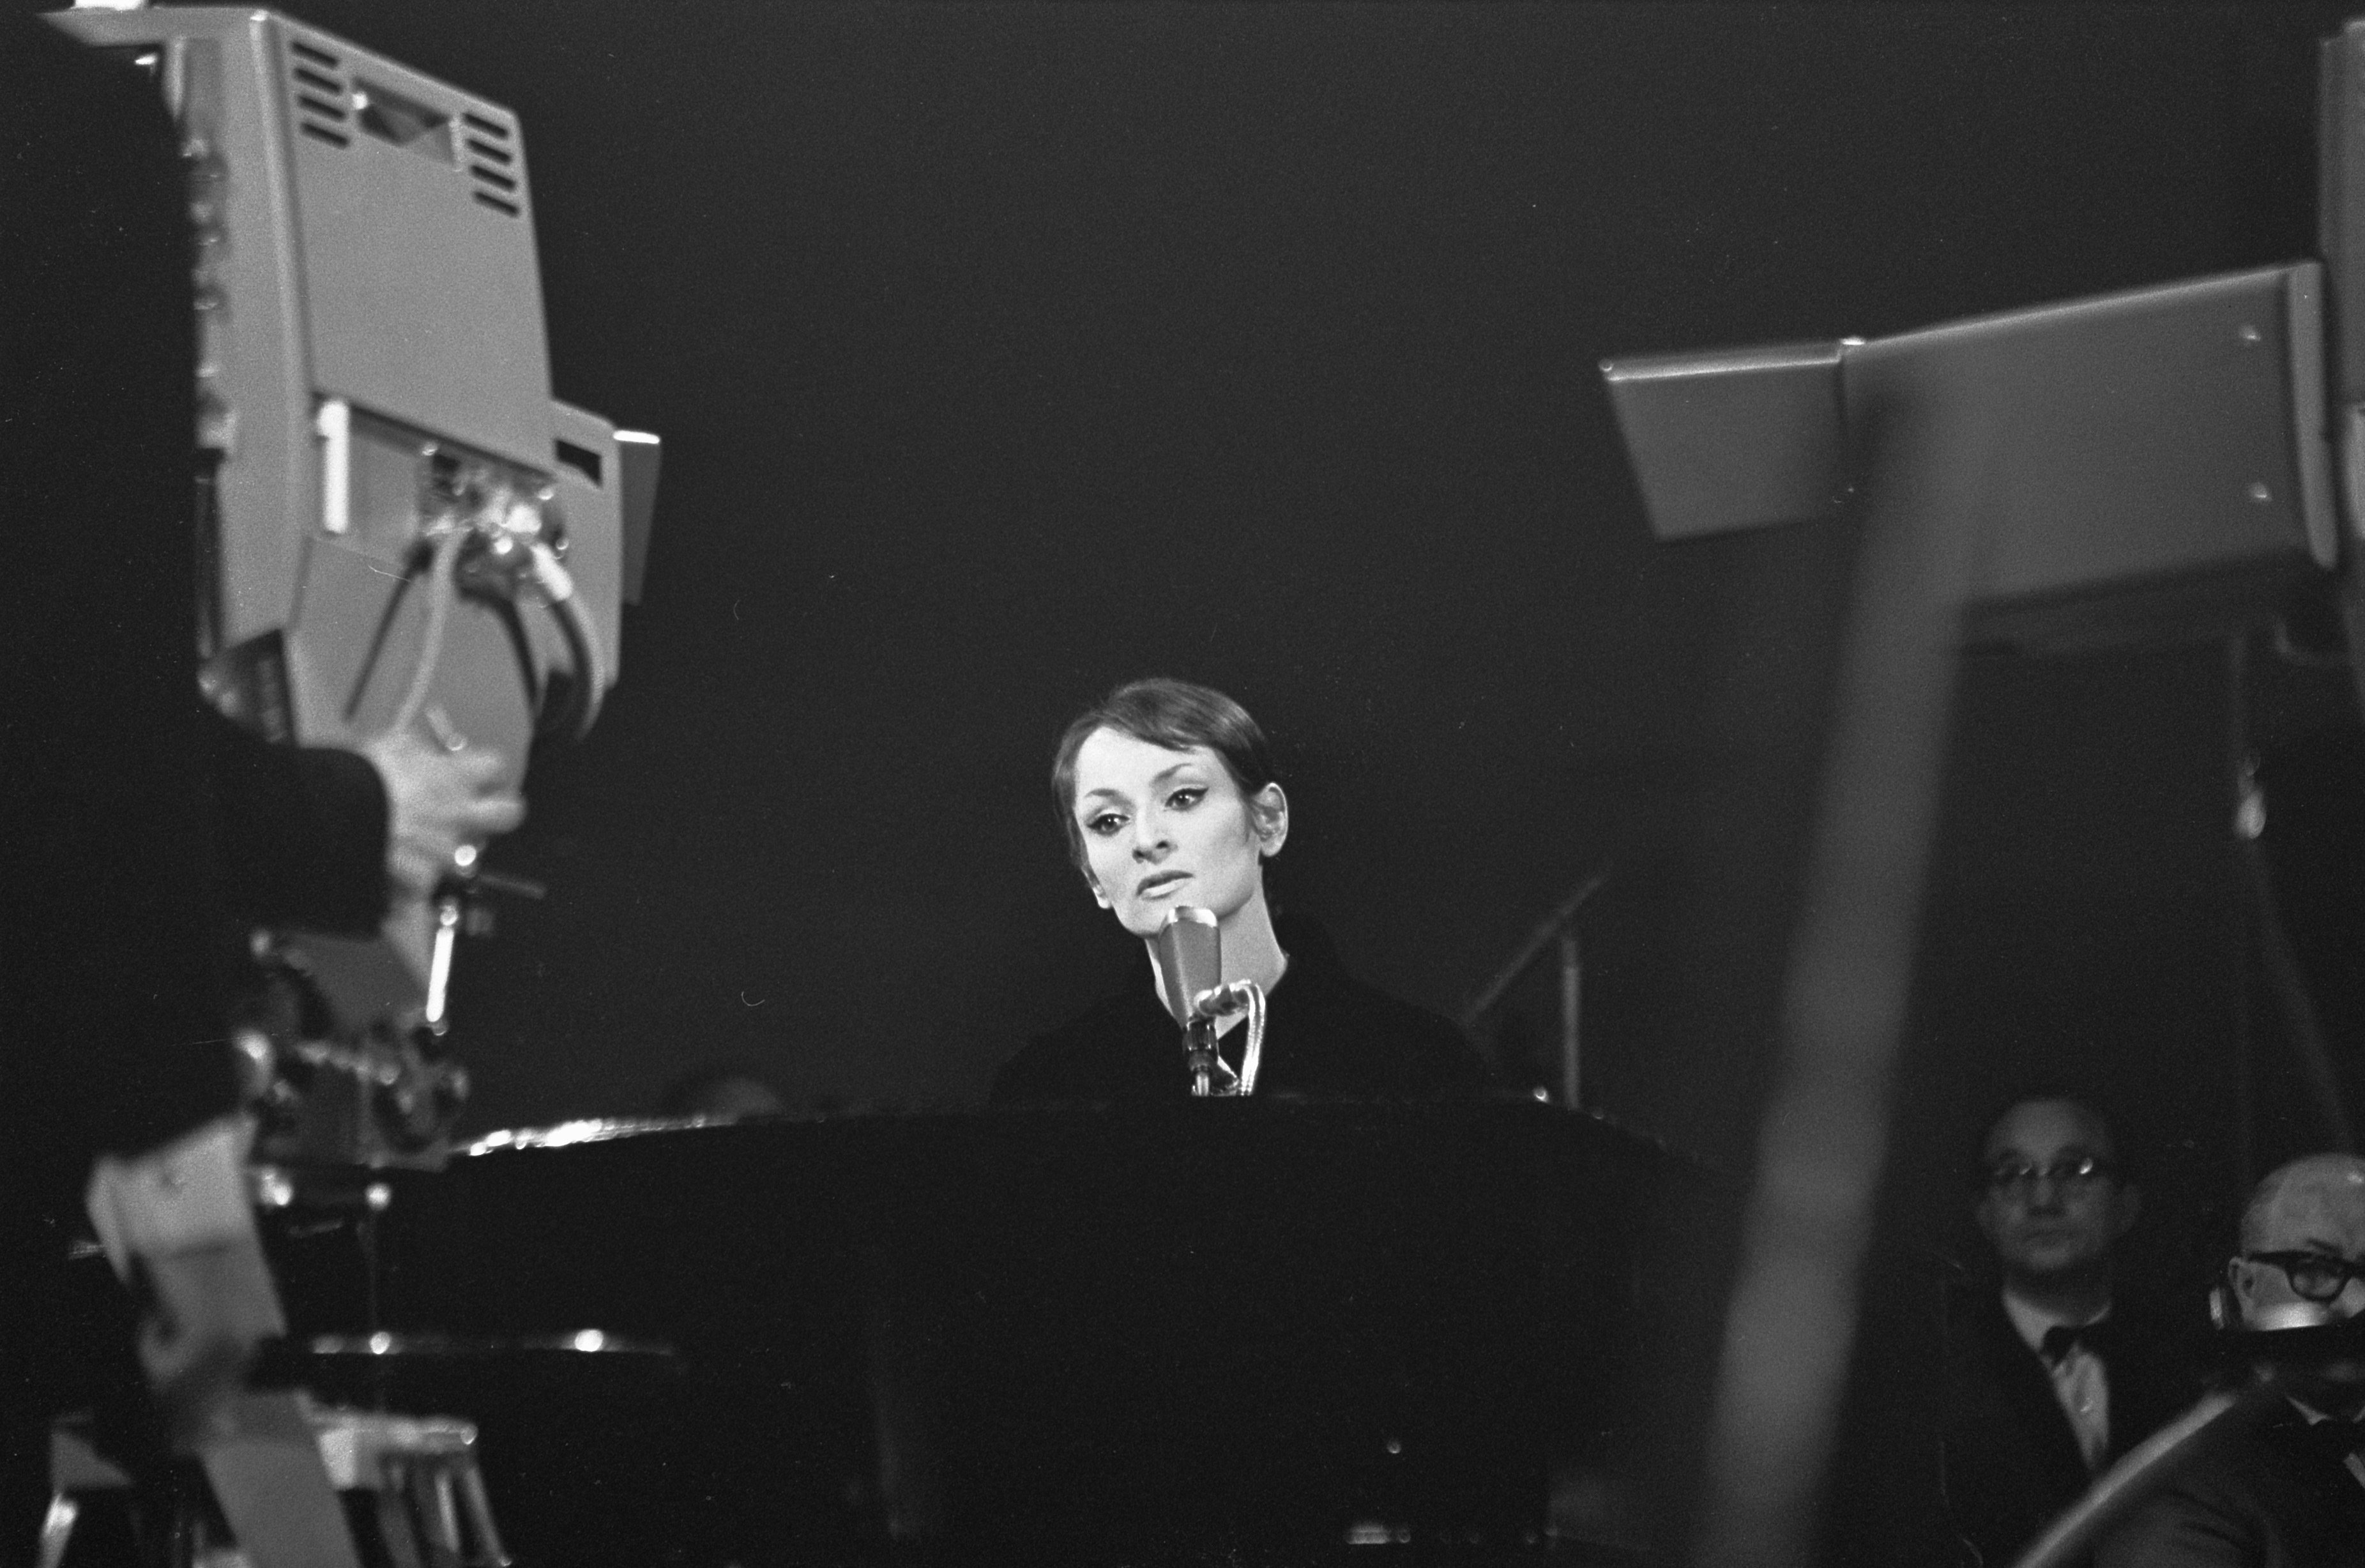 Grand_Gala_du_Disque_Populaire_1968_-_Barbara